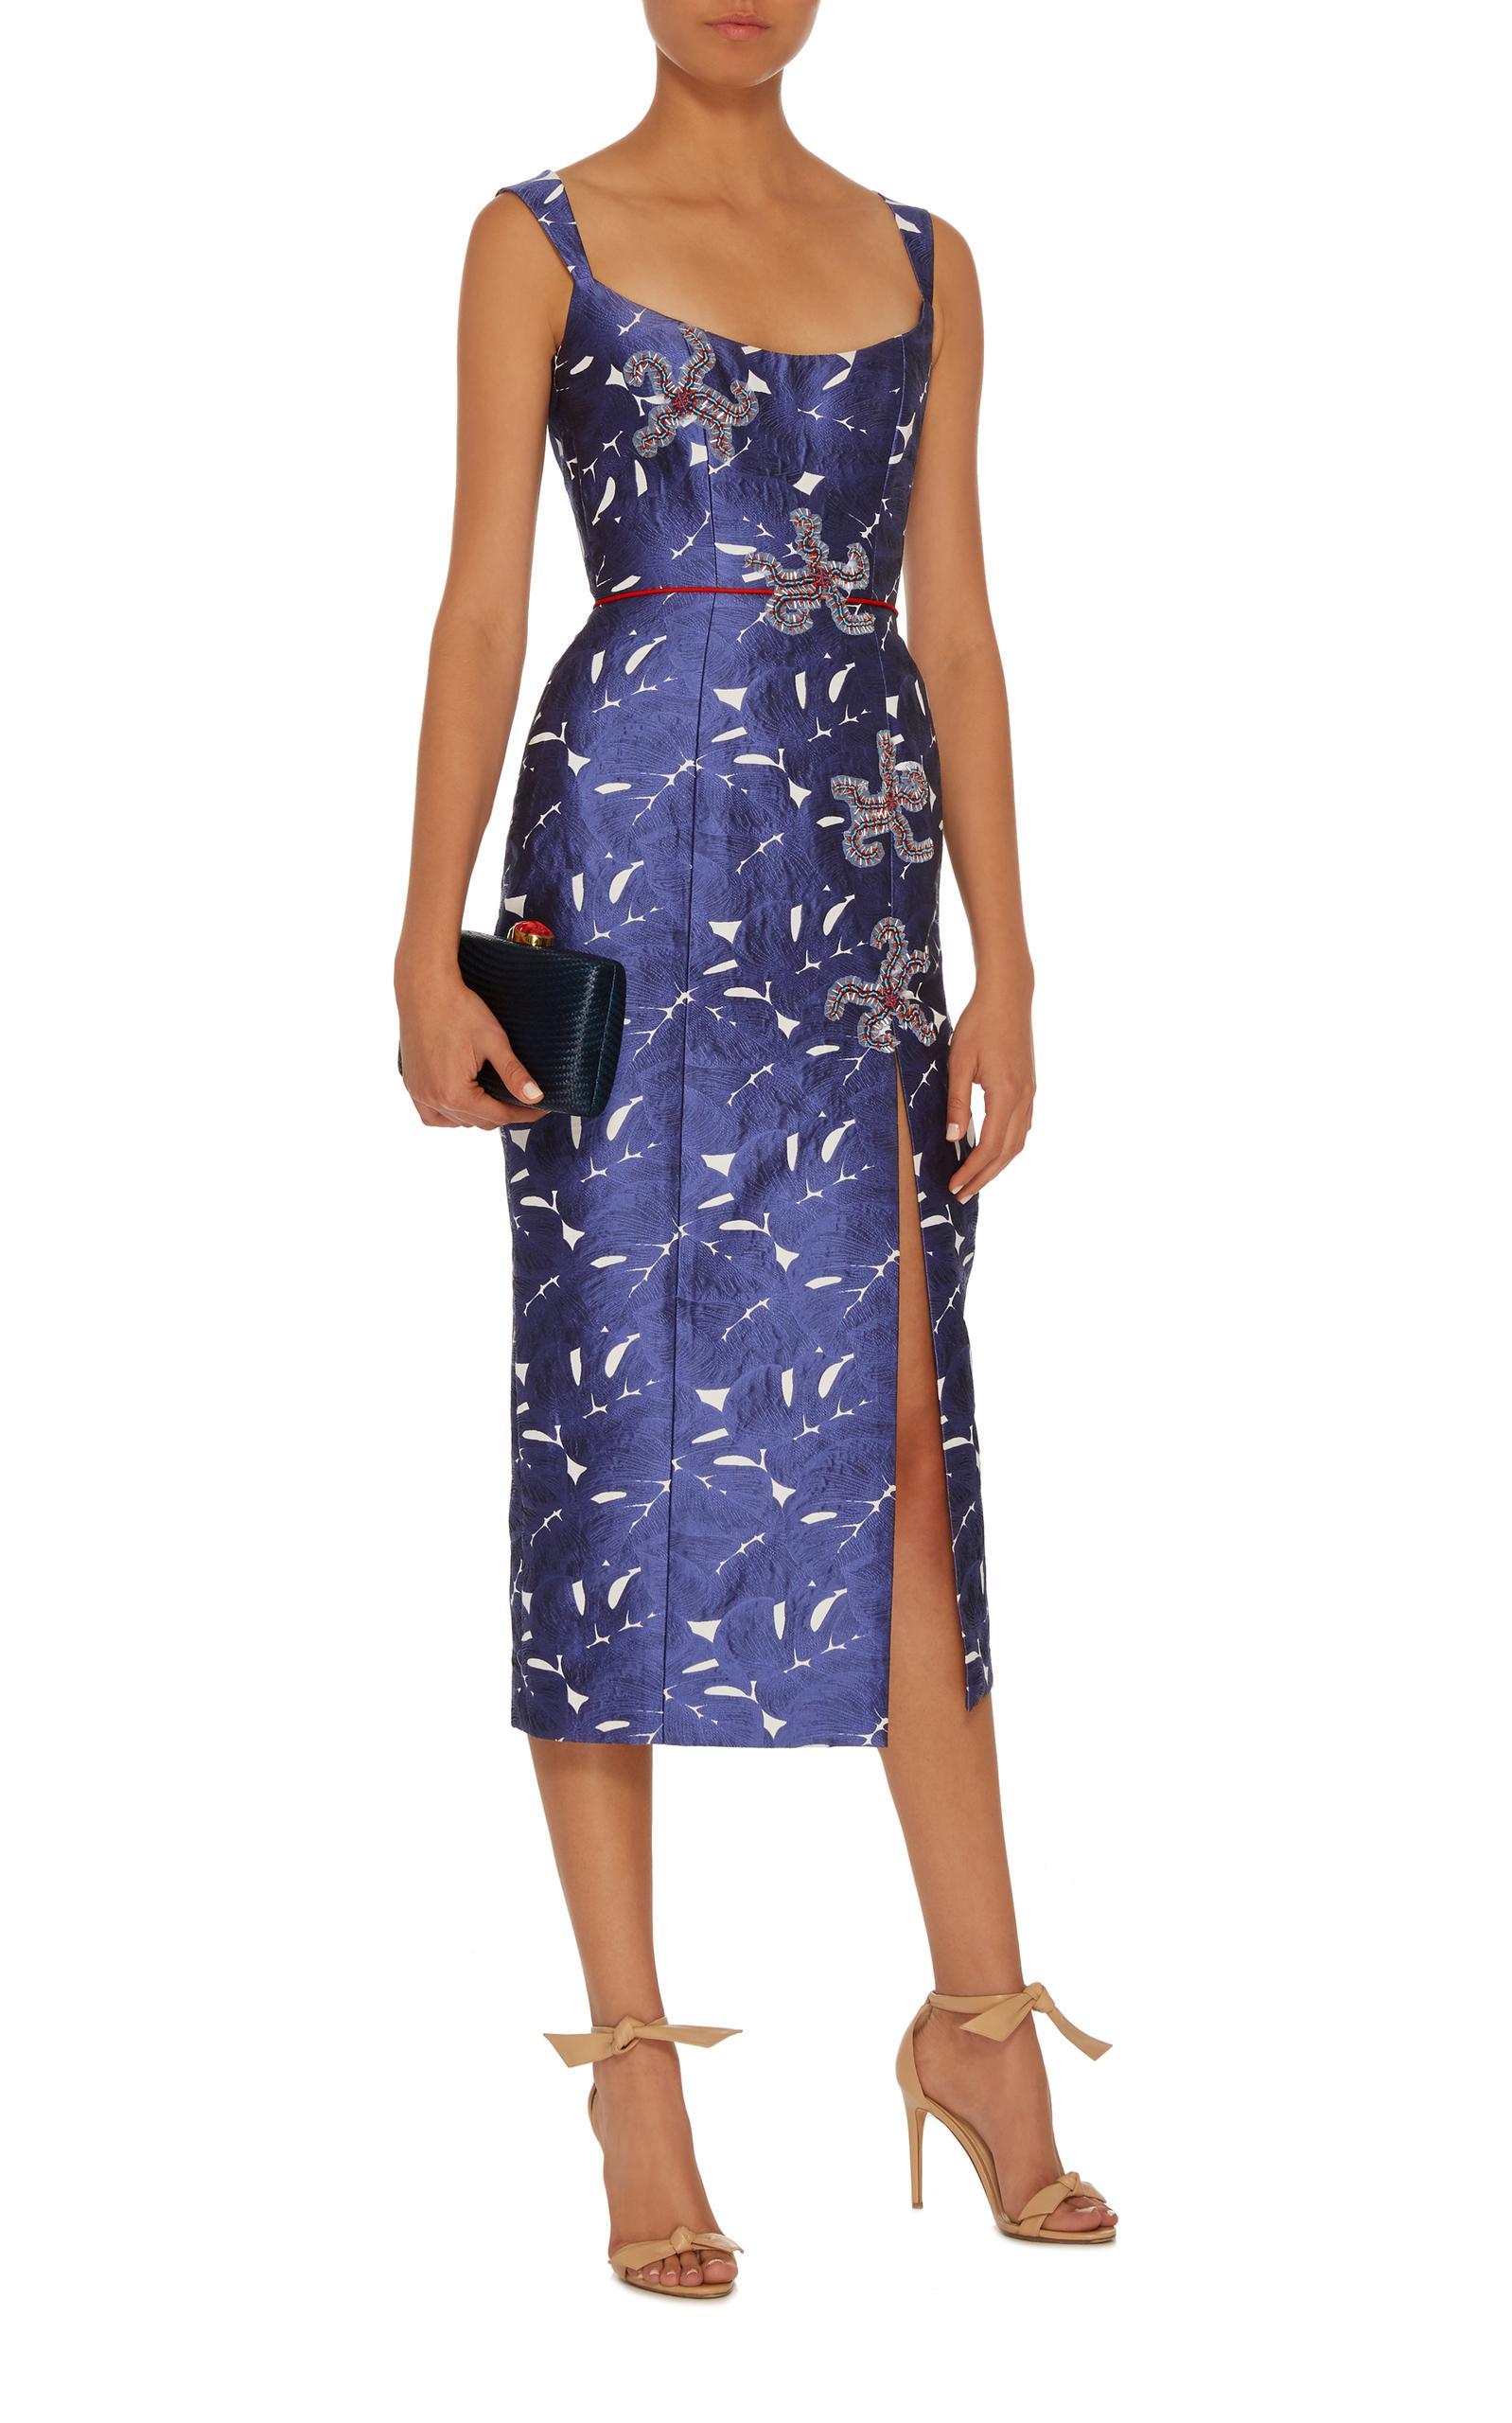 Thalassa Brittle Starfish Corset Dress Markarian jwKw5o61V4